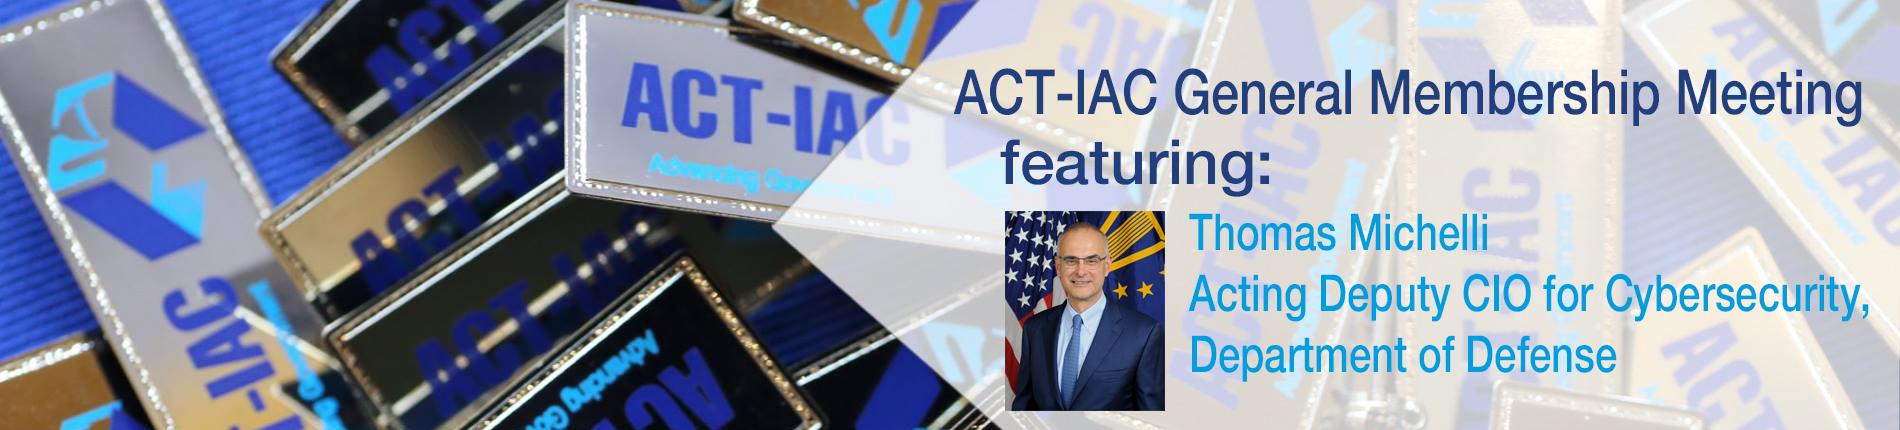 ACT-IAC November Membership Meeting